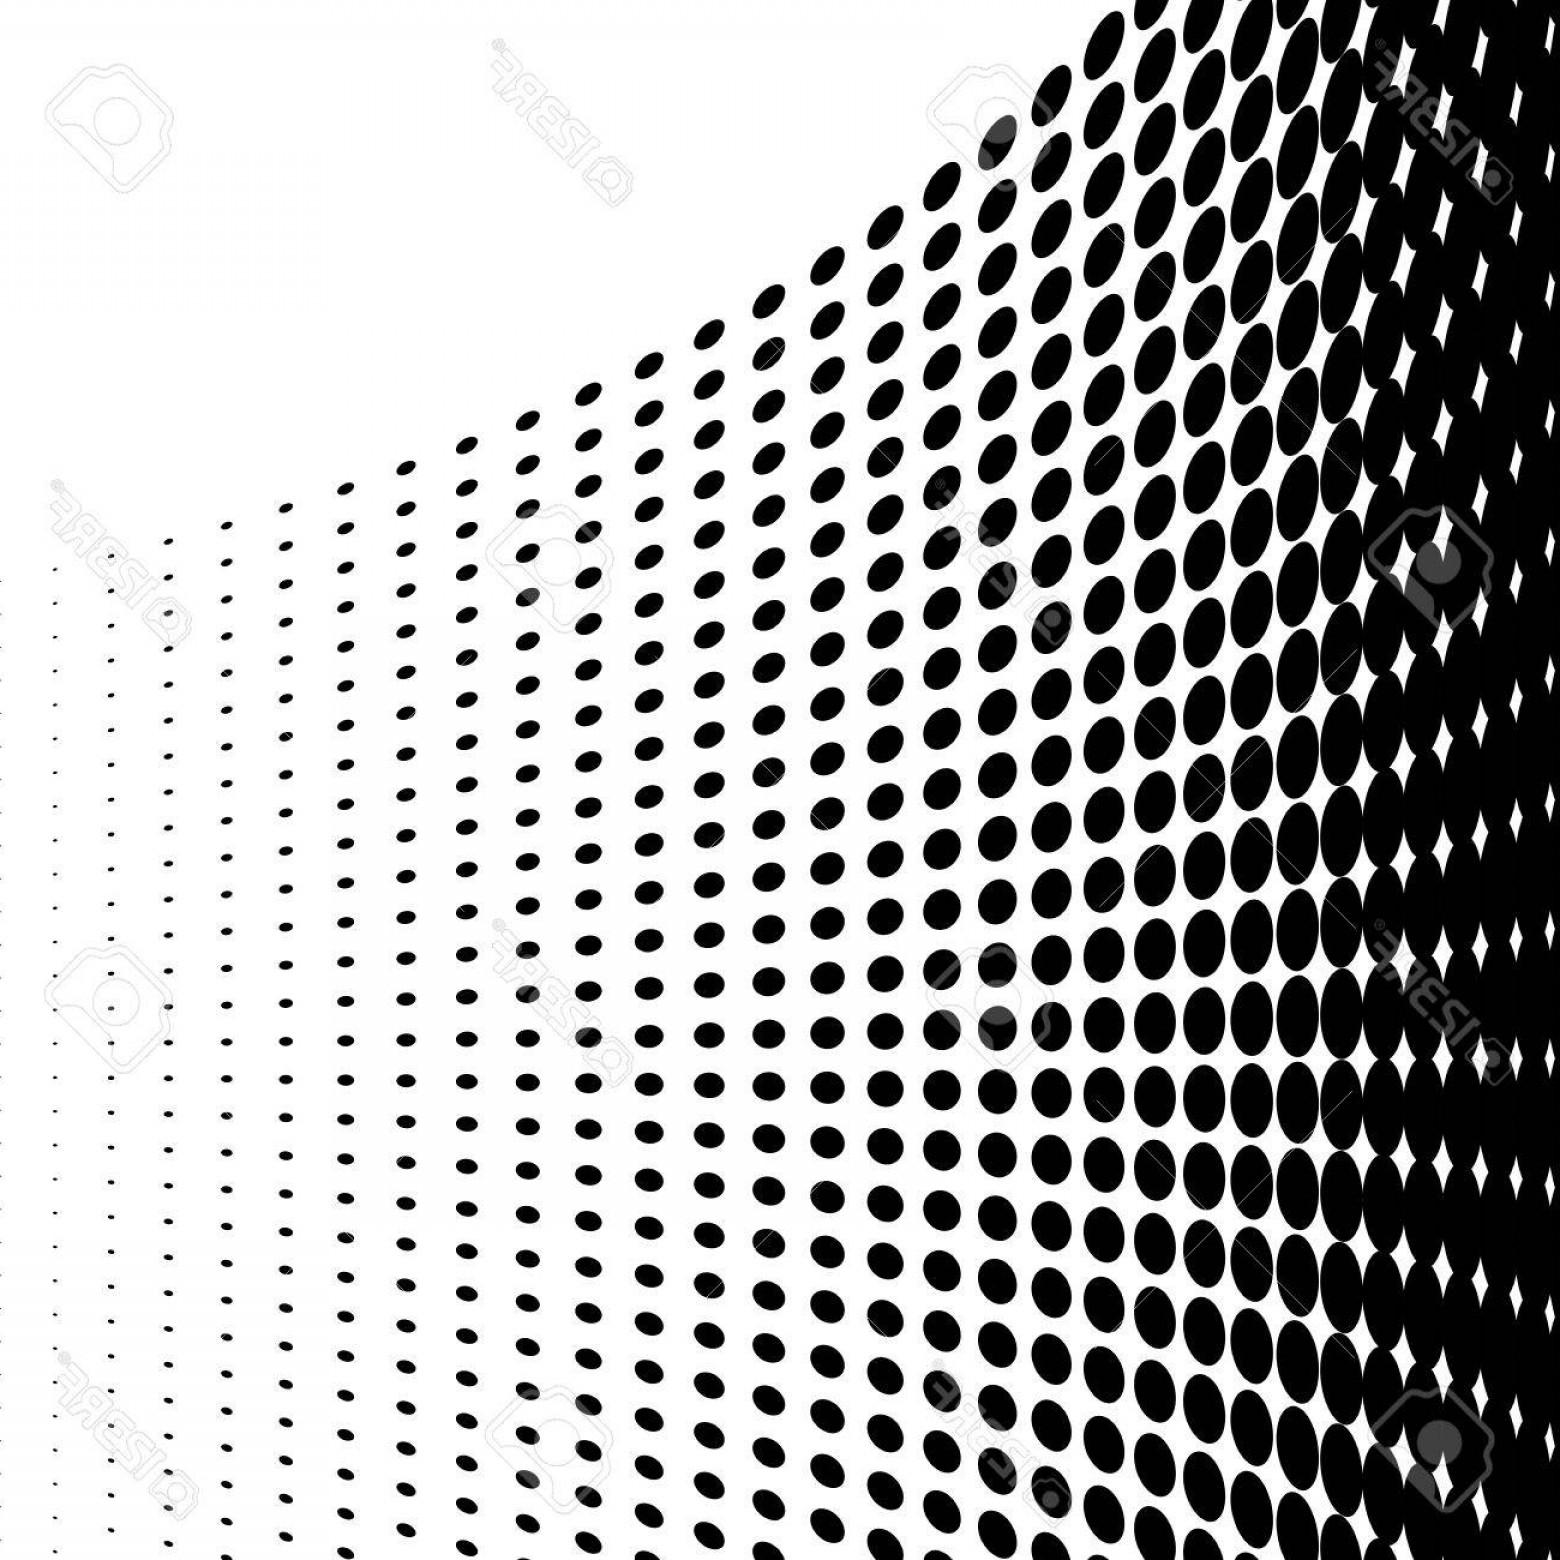 1560x1560 Photostock Vector Halftone Illustrator Halftone Dots Halftone